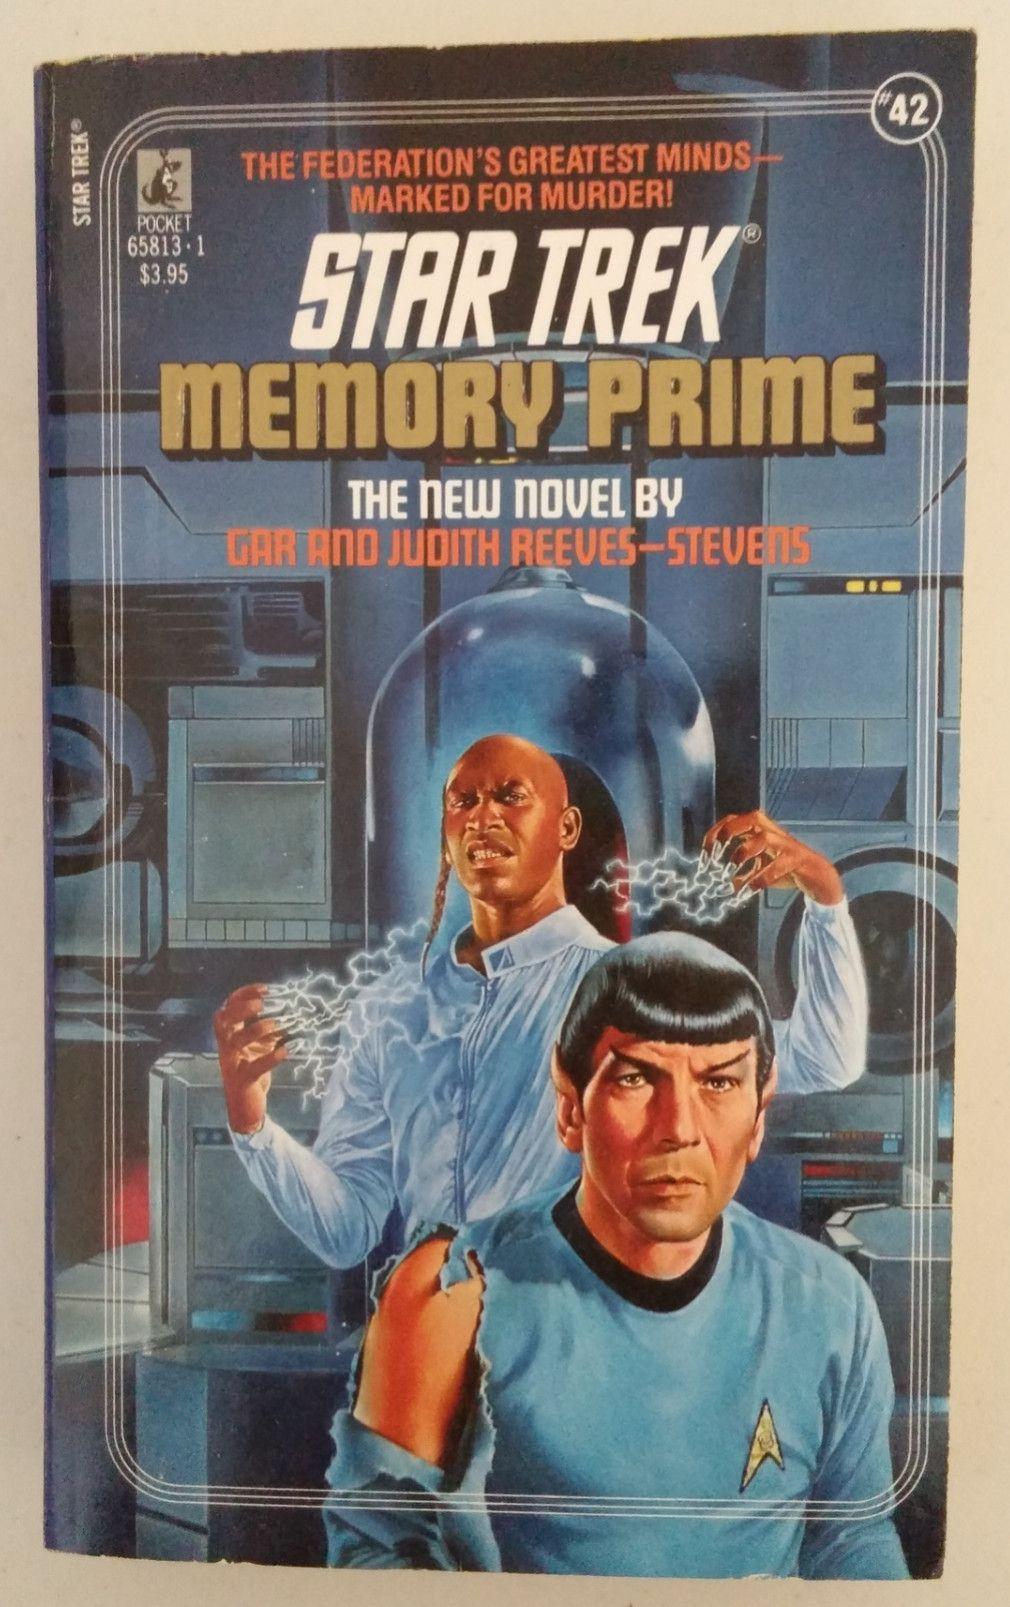 Star Trek: Memory Prime -- Gar and Judith Reeves-Stevens